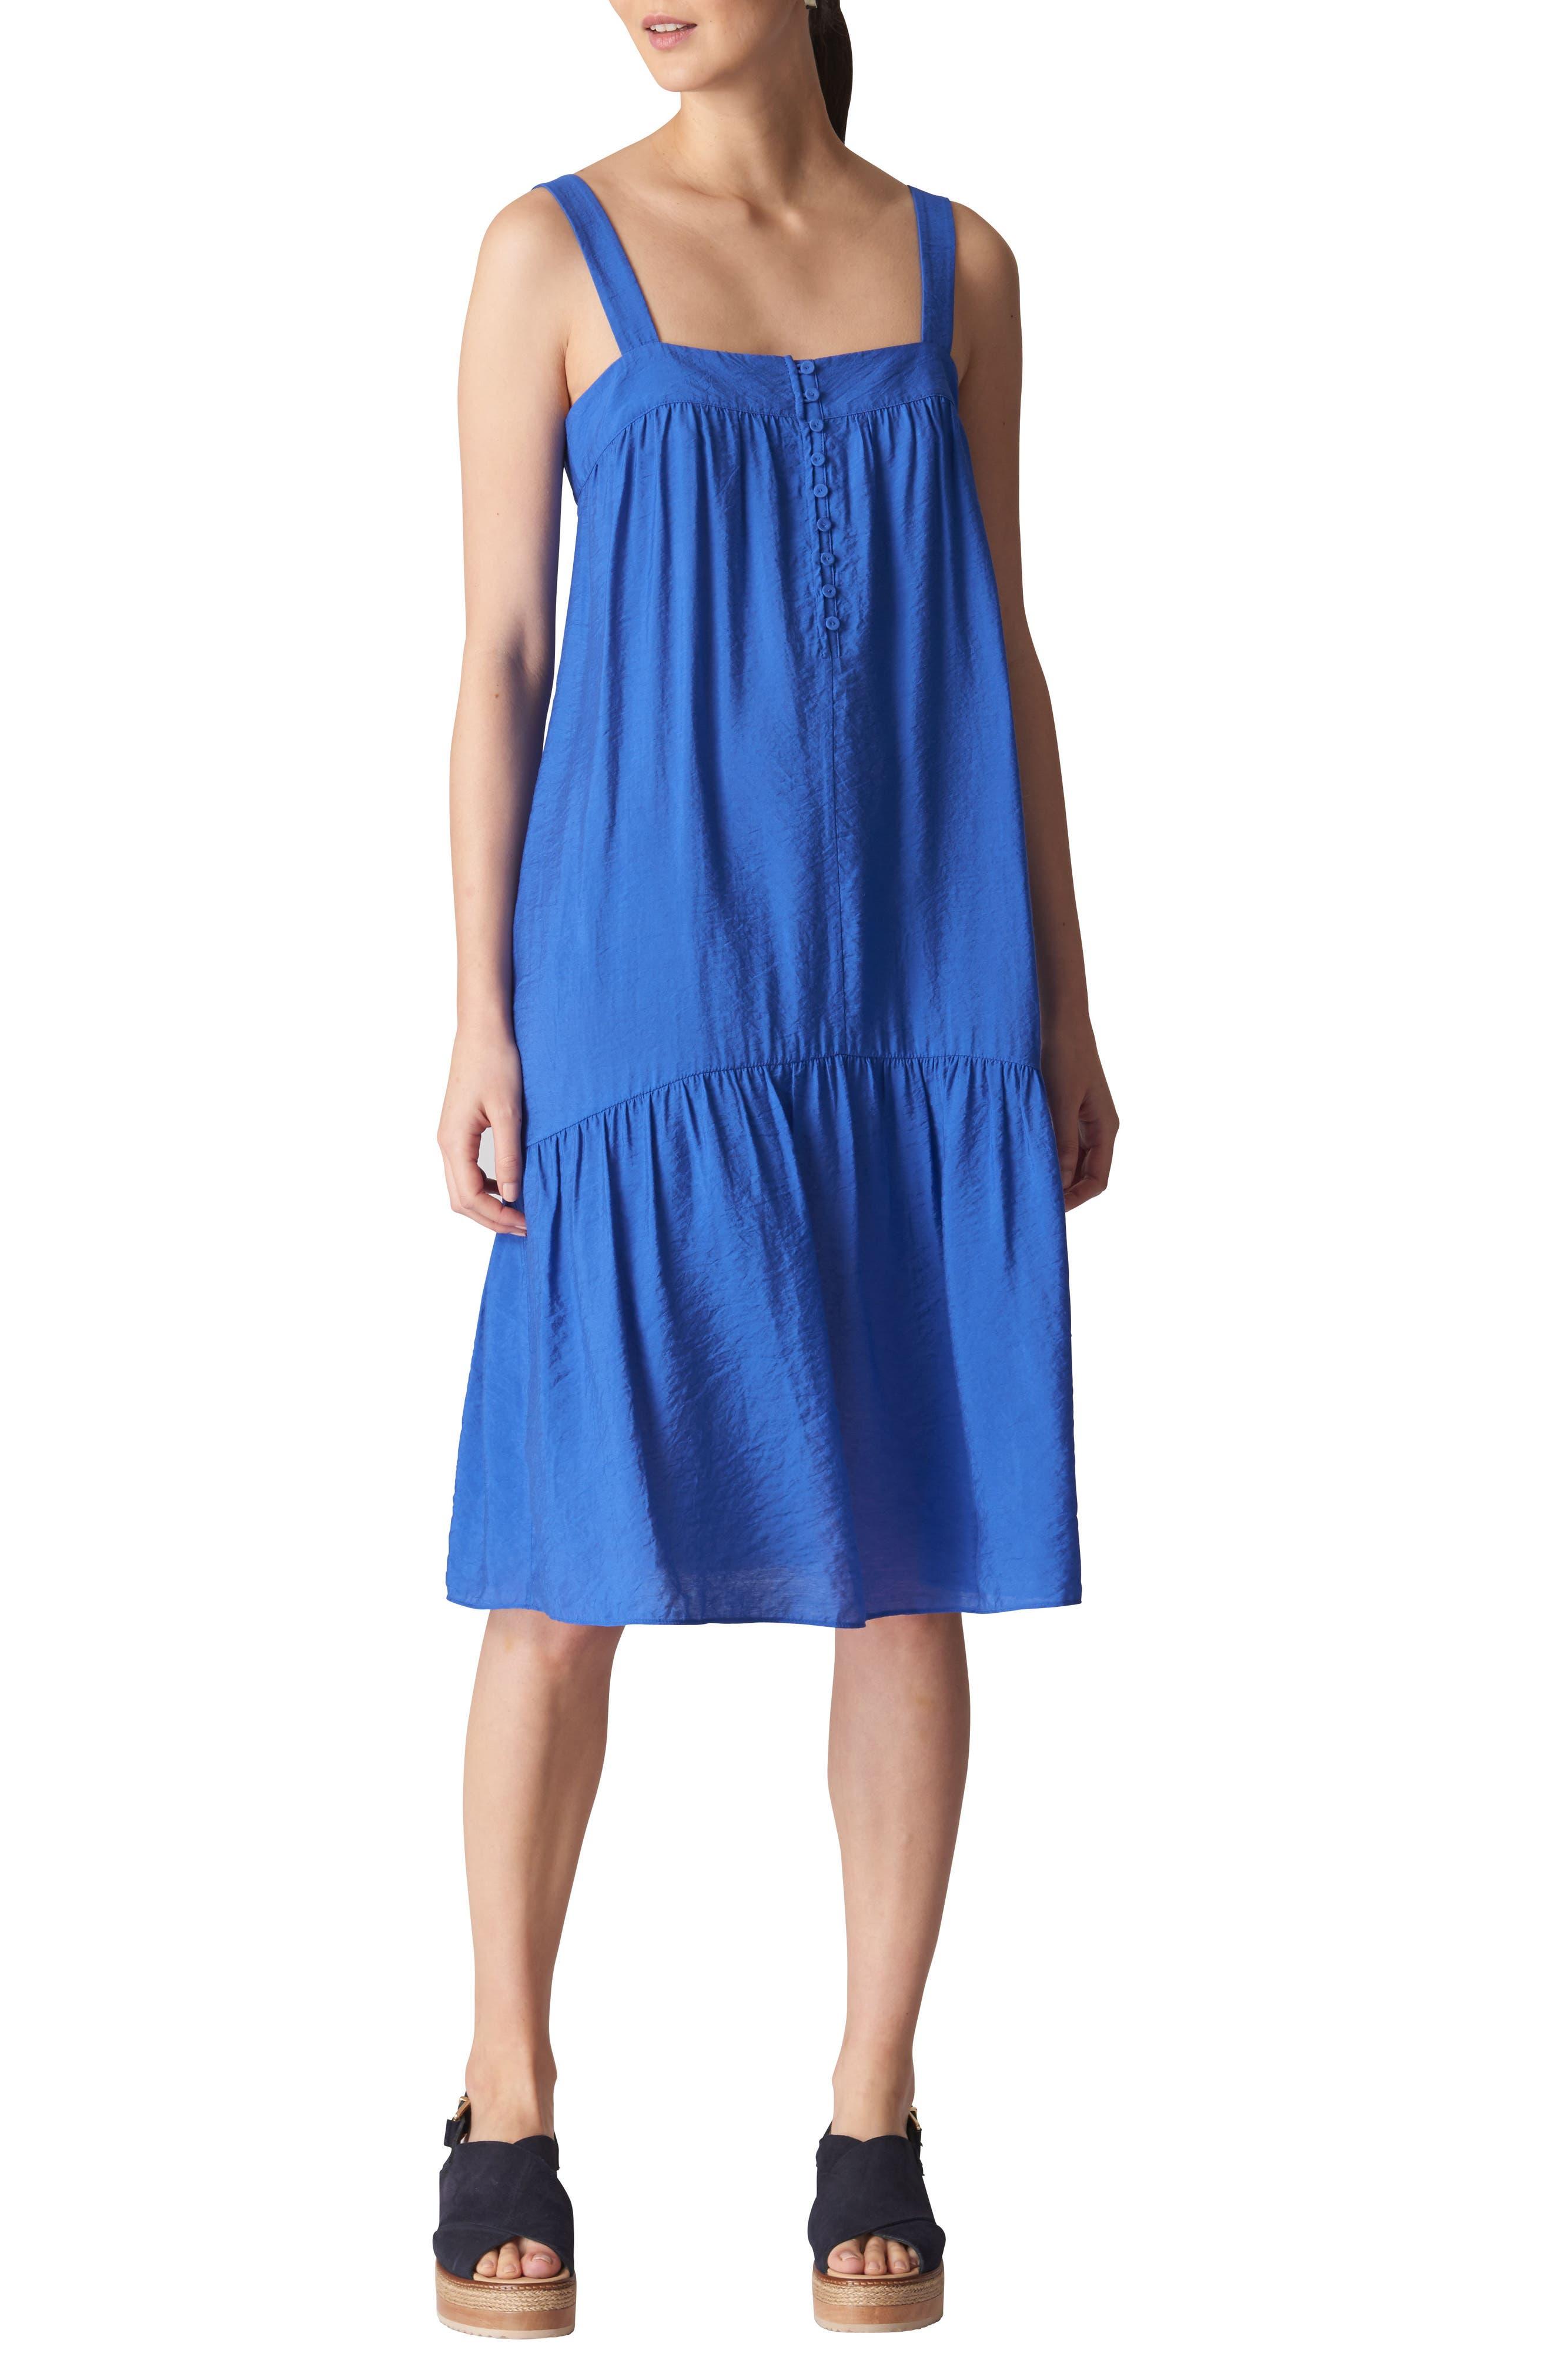 Florencia Sun Dress,                             Main thumbnail 1, color,                             Blue